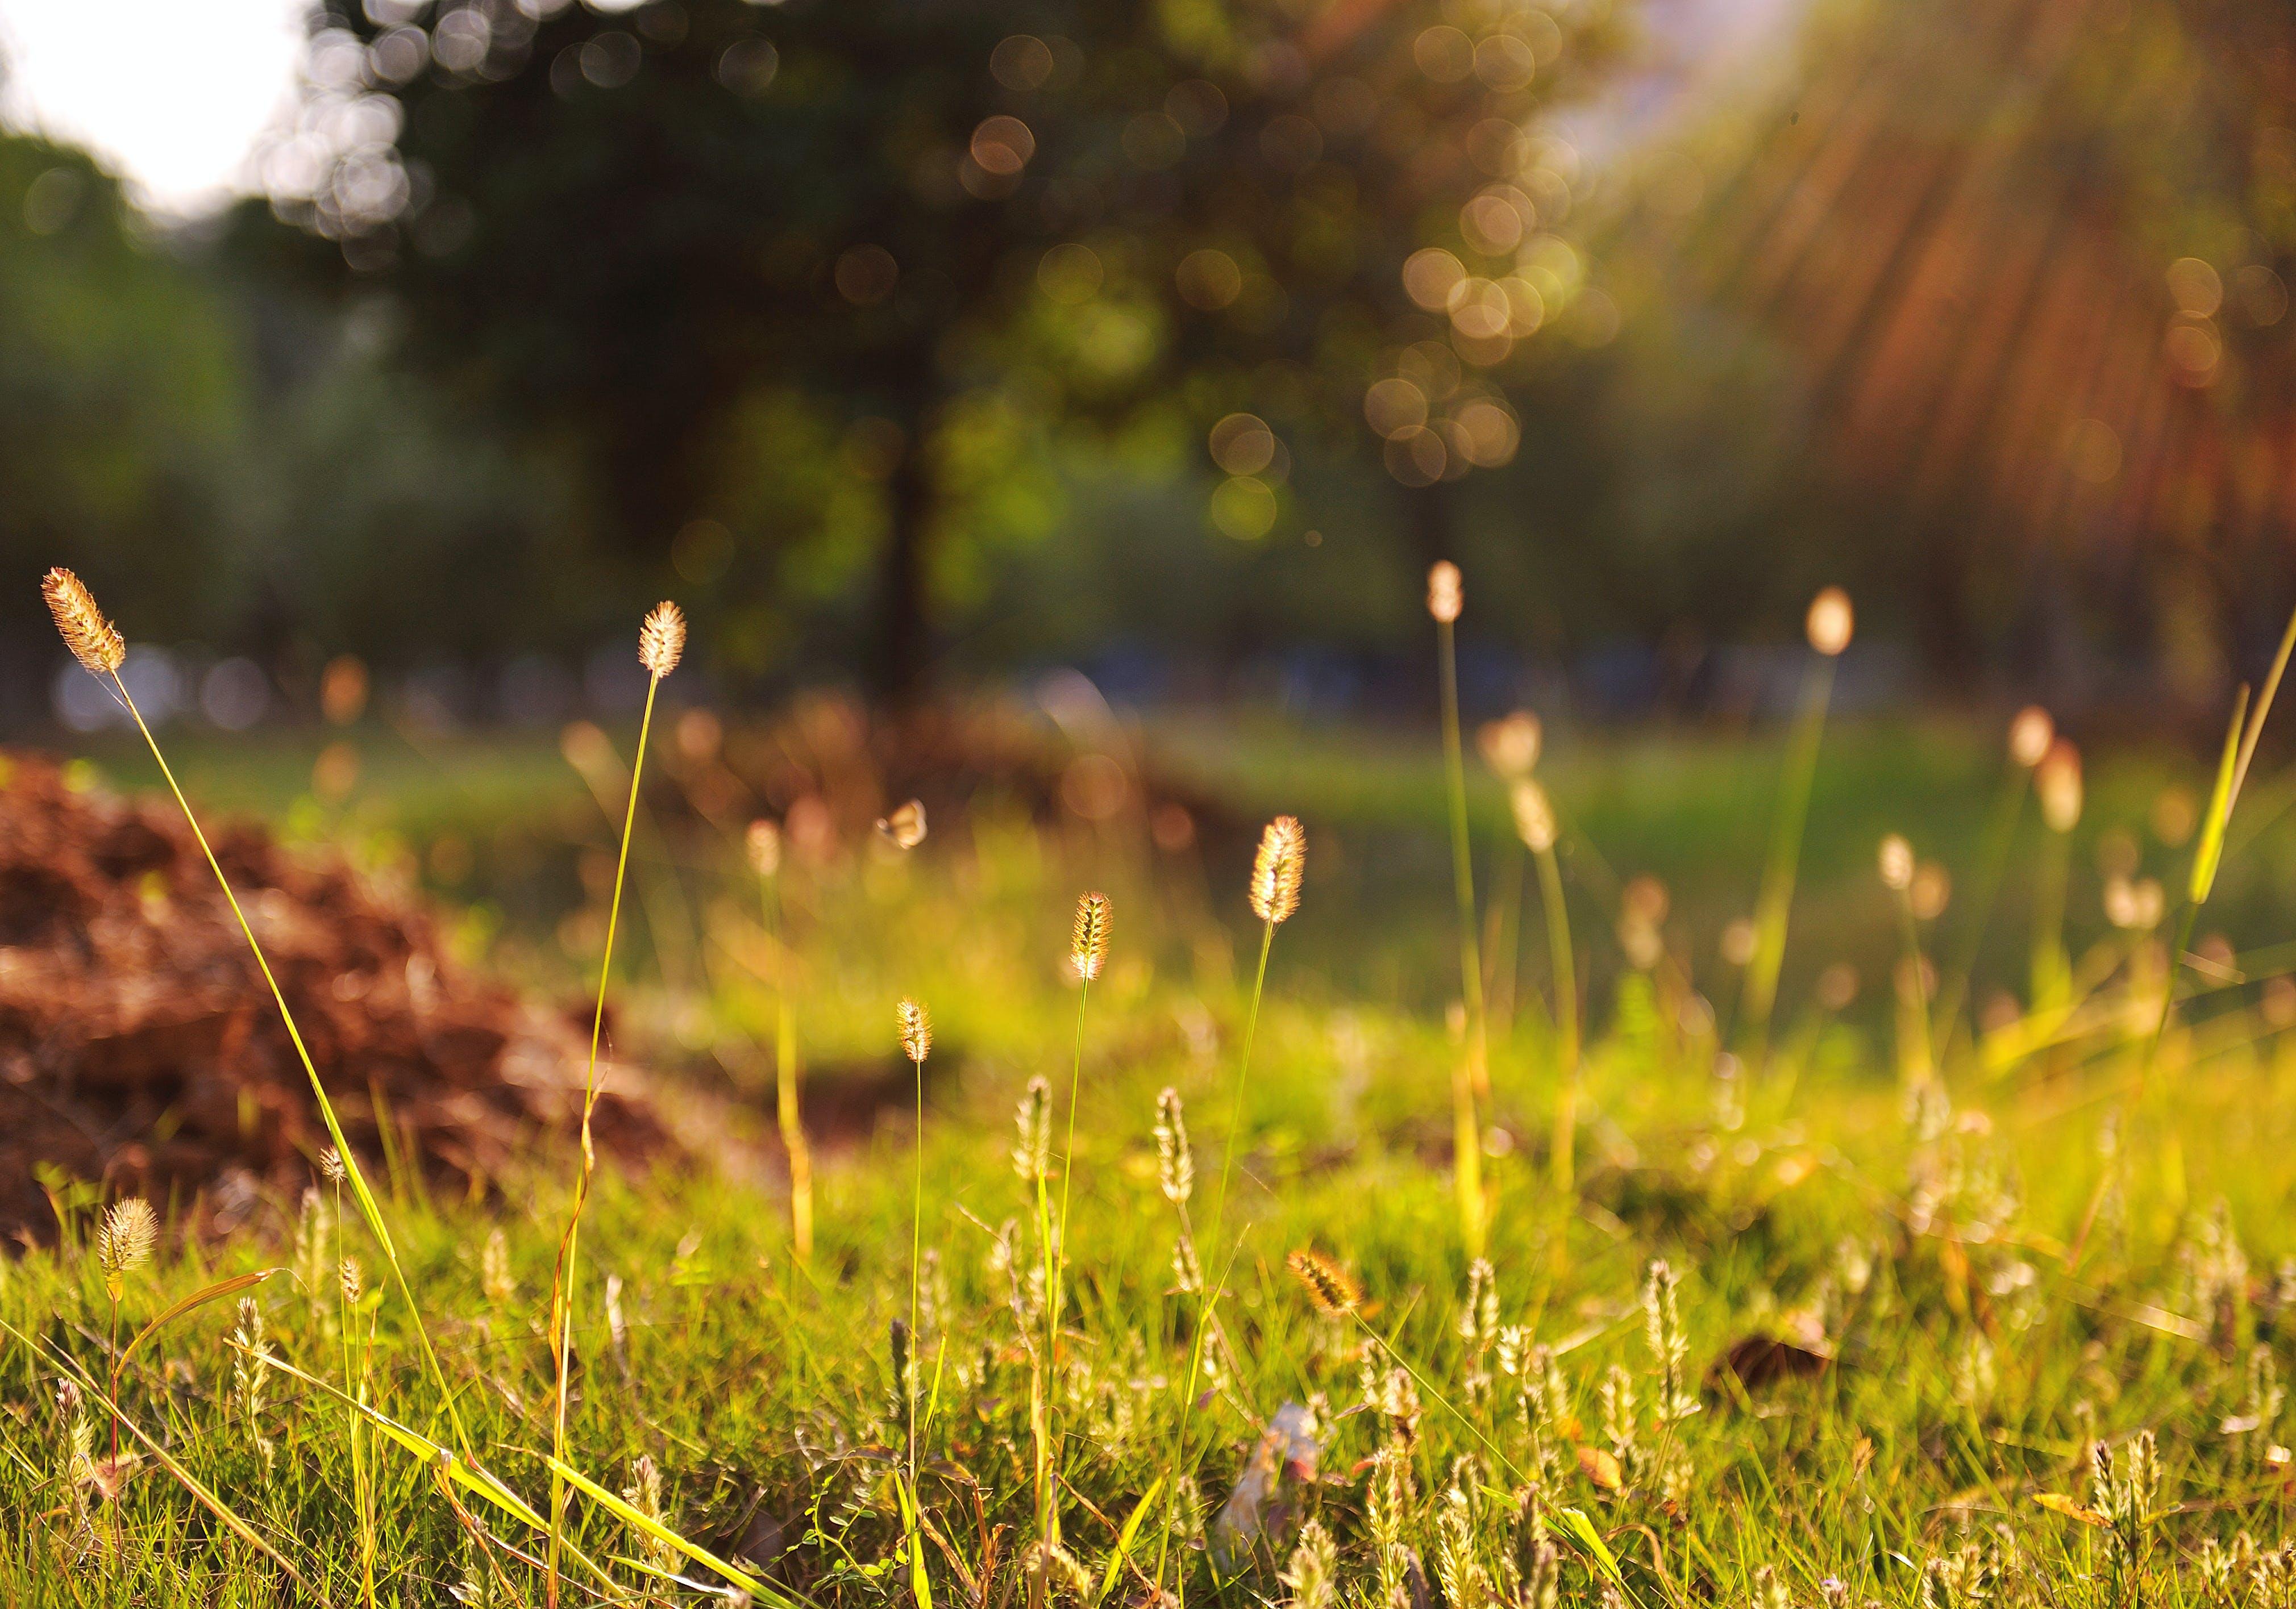 Green Grass during Daytime